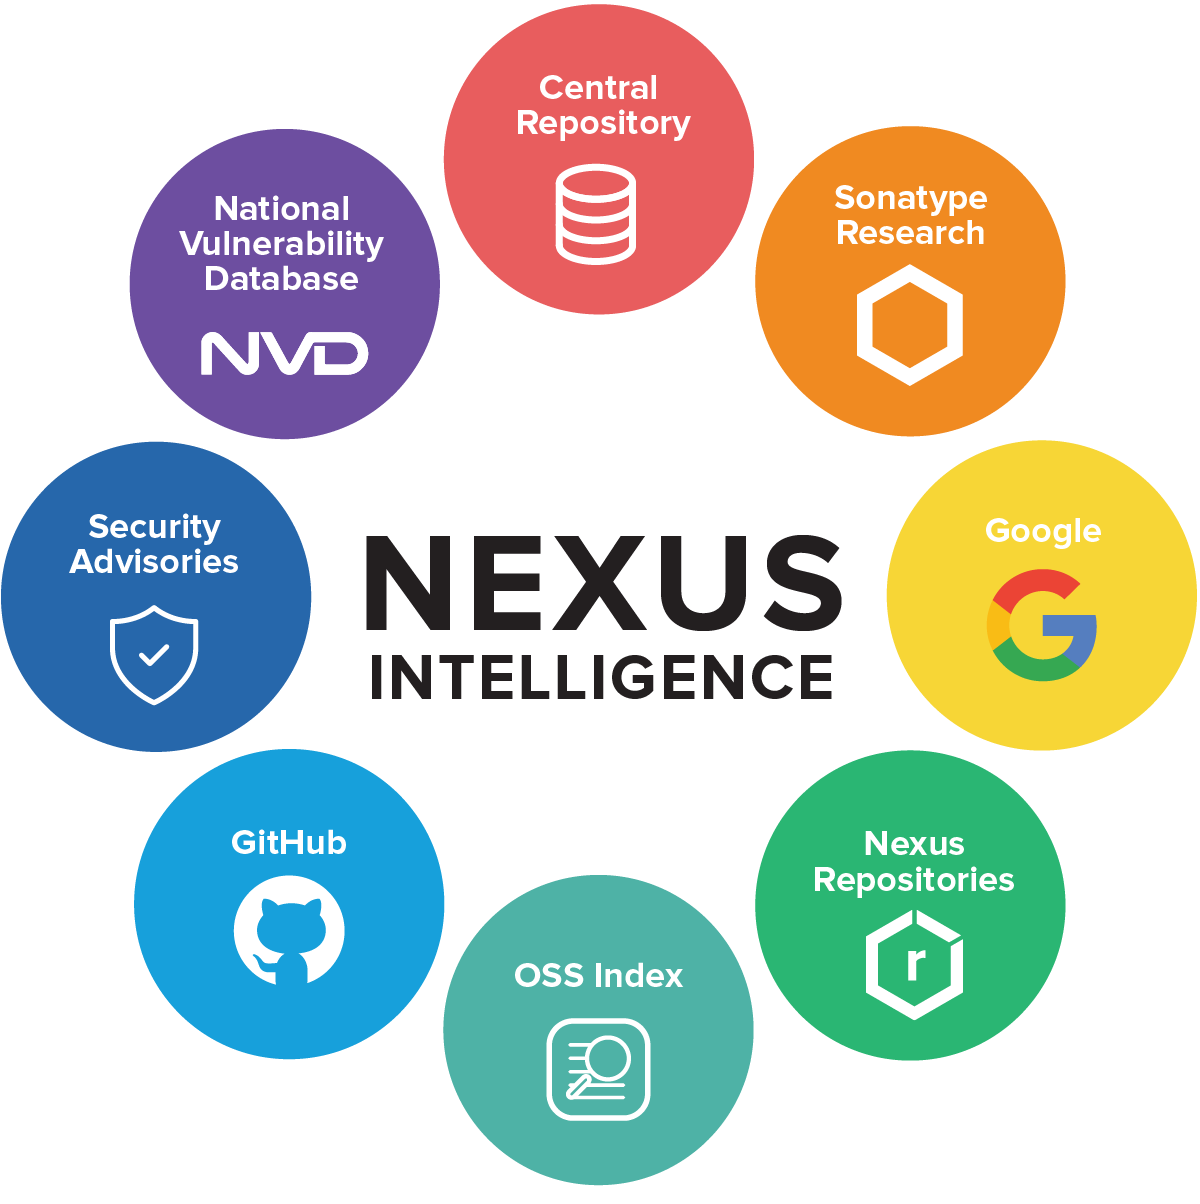 Intelligence_Nexus_new@2x